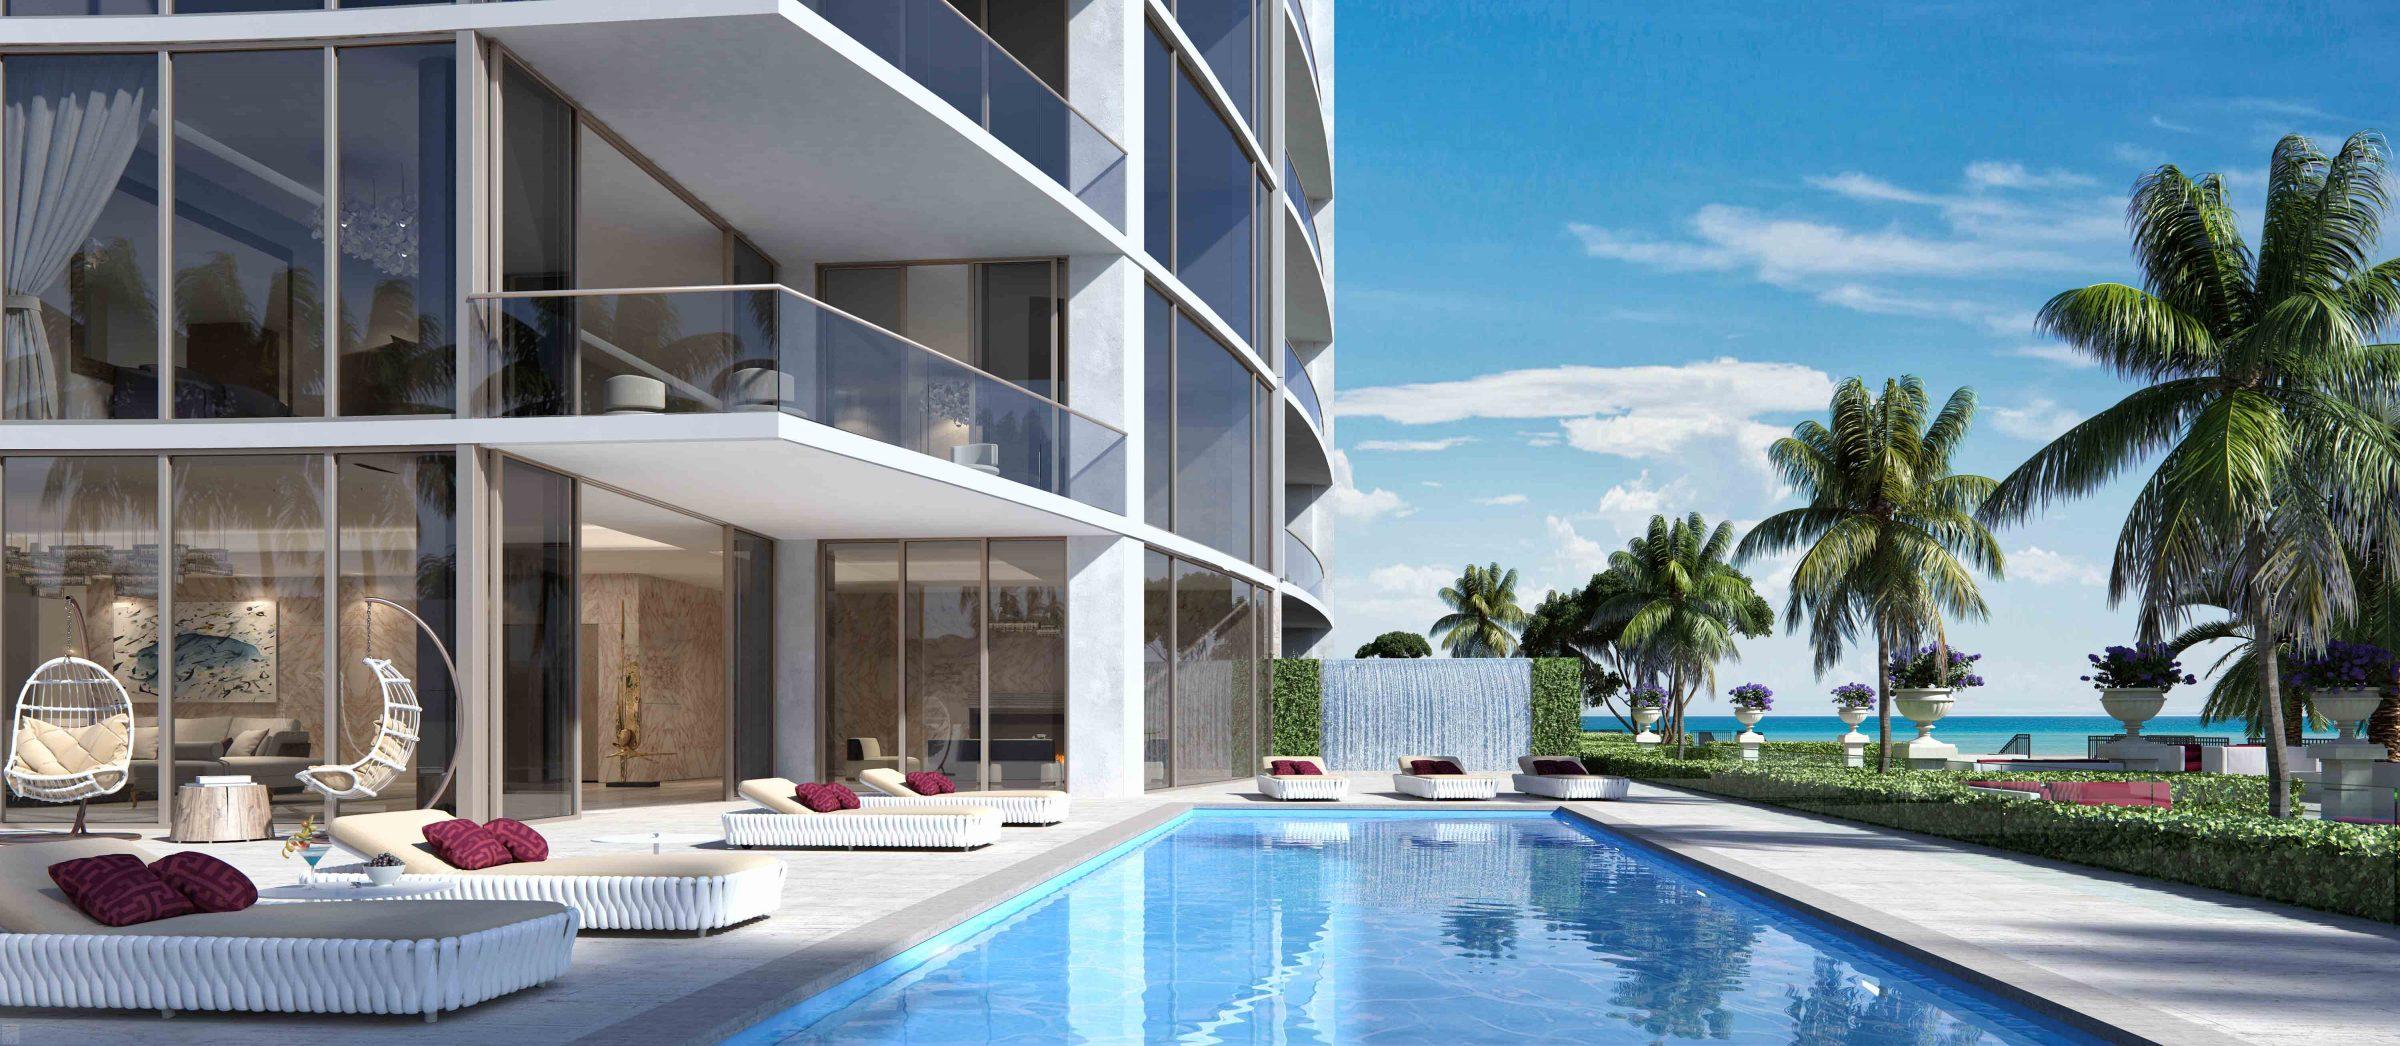 Casa-D-Oro-Pool-terrace-low-res-2400x1046.jpg